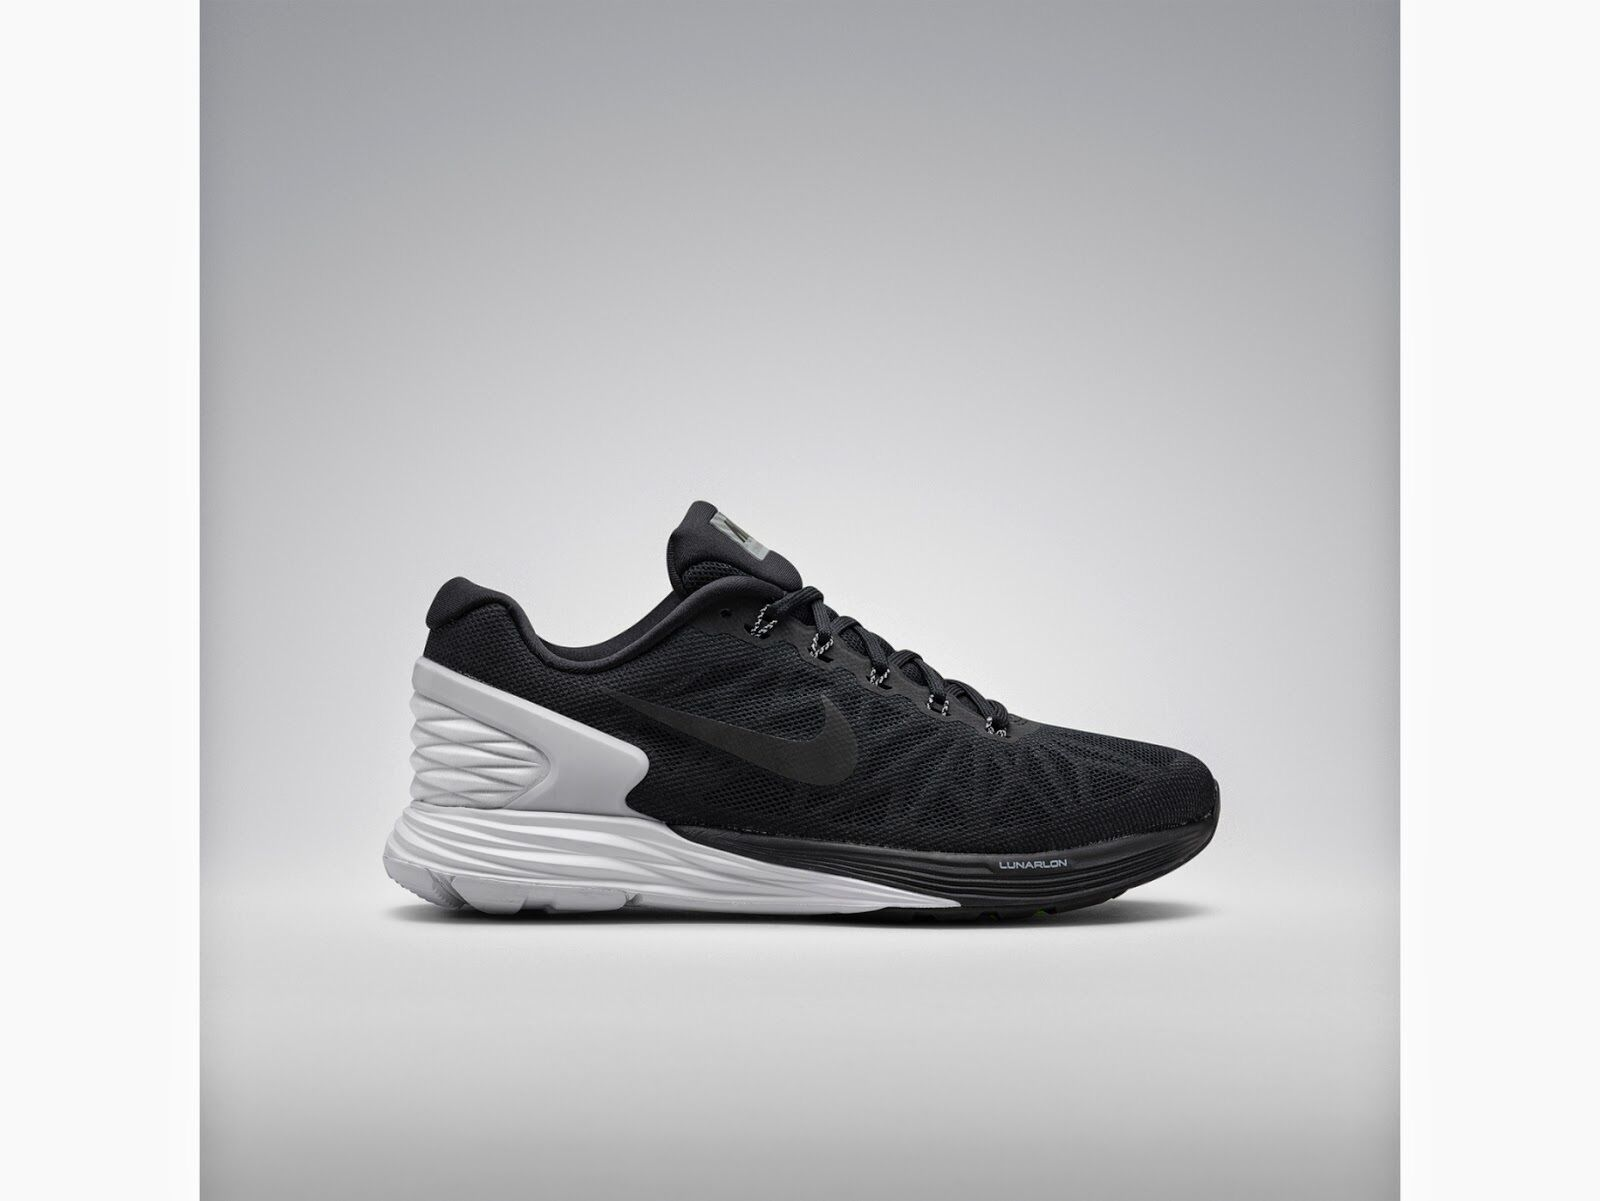 huge discount 929f5 e58e4 ... DS Nike Air Jordan Retro Retro Retro 10 OVO Size 8 Flight Club tbh gold  toe ...